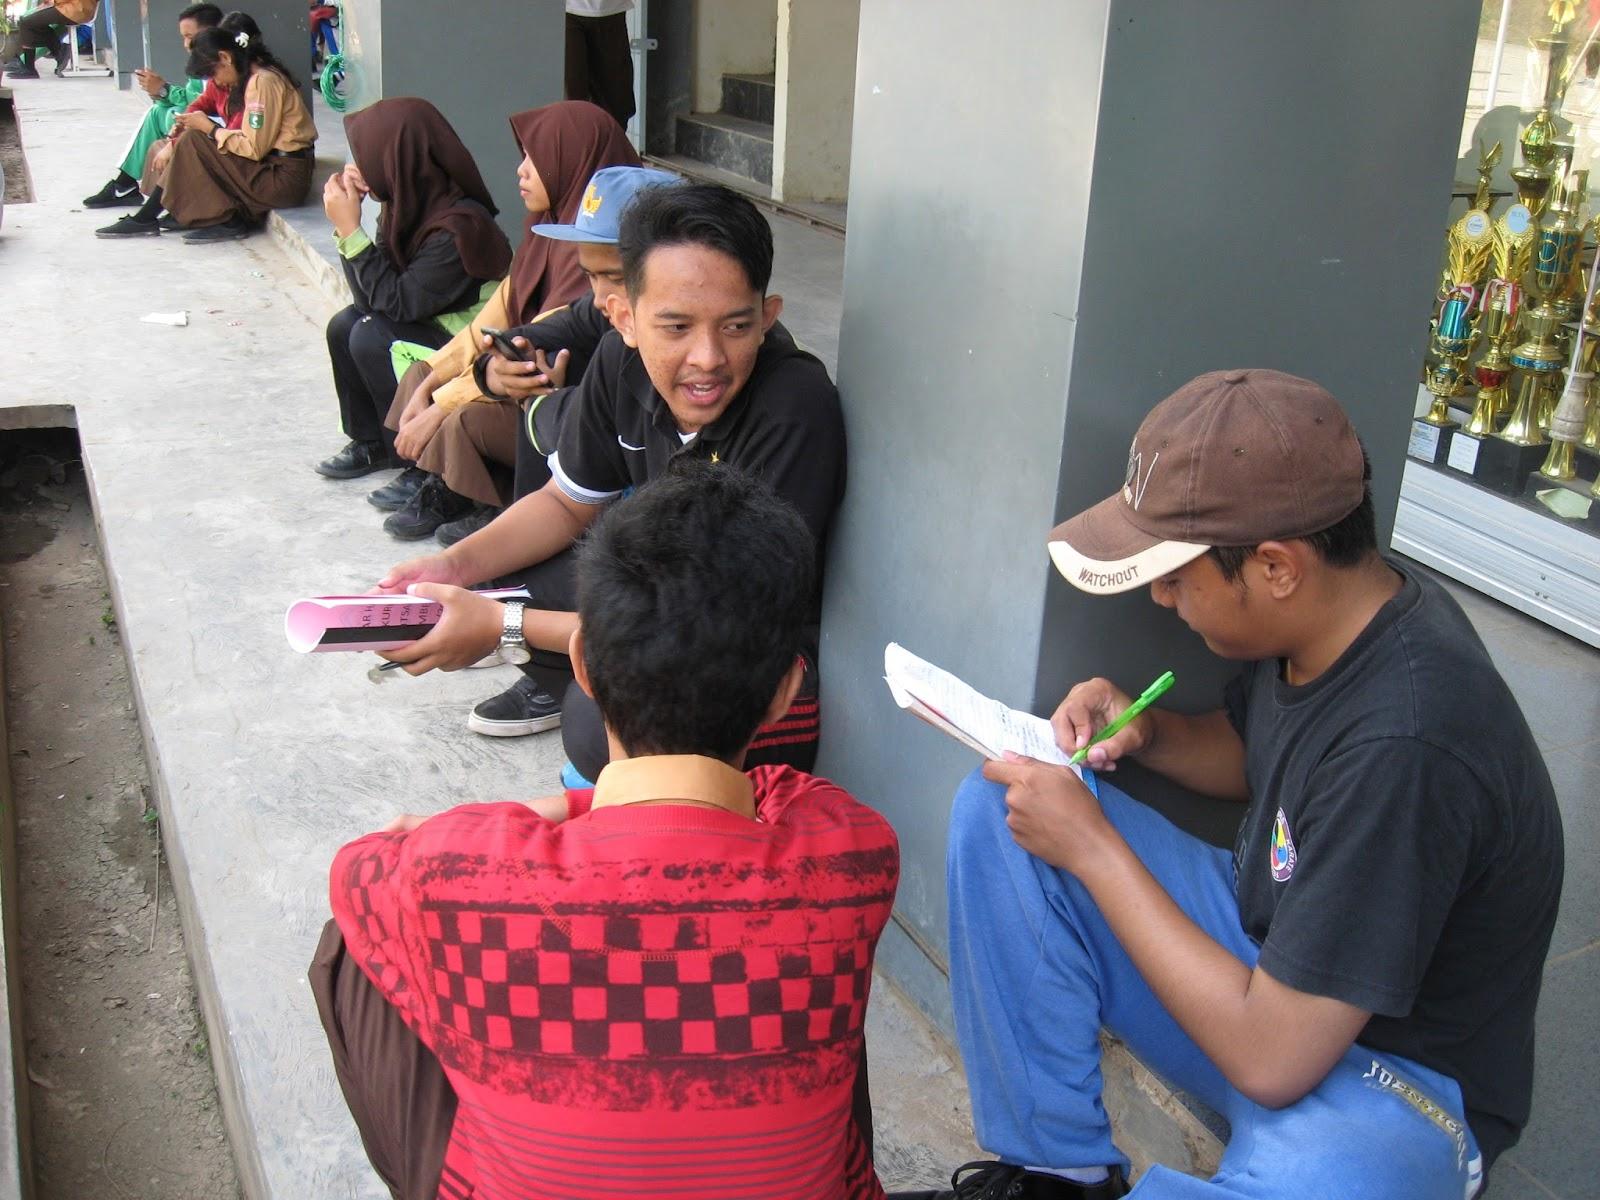 Wawancara Tim Jurnalistik ARJUNA RAFI